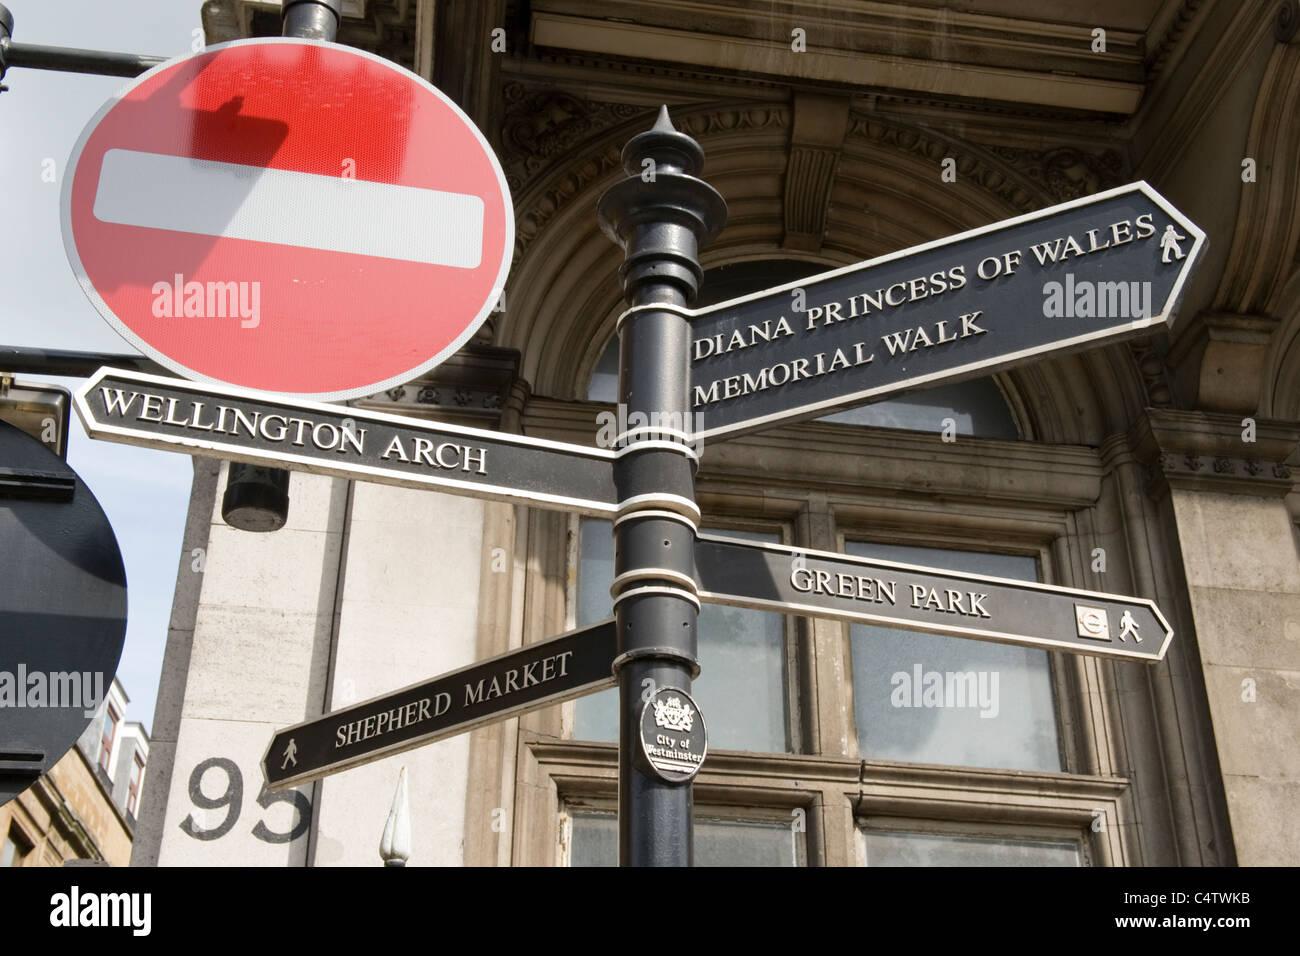 London Mayfair Piccadilly pedestrian tourist signpost to Wellington Arch Shepherd Market Green Park Princess Diana - Stock Image